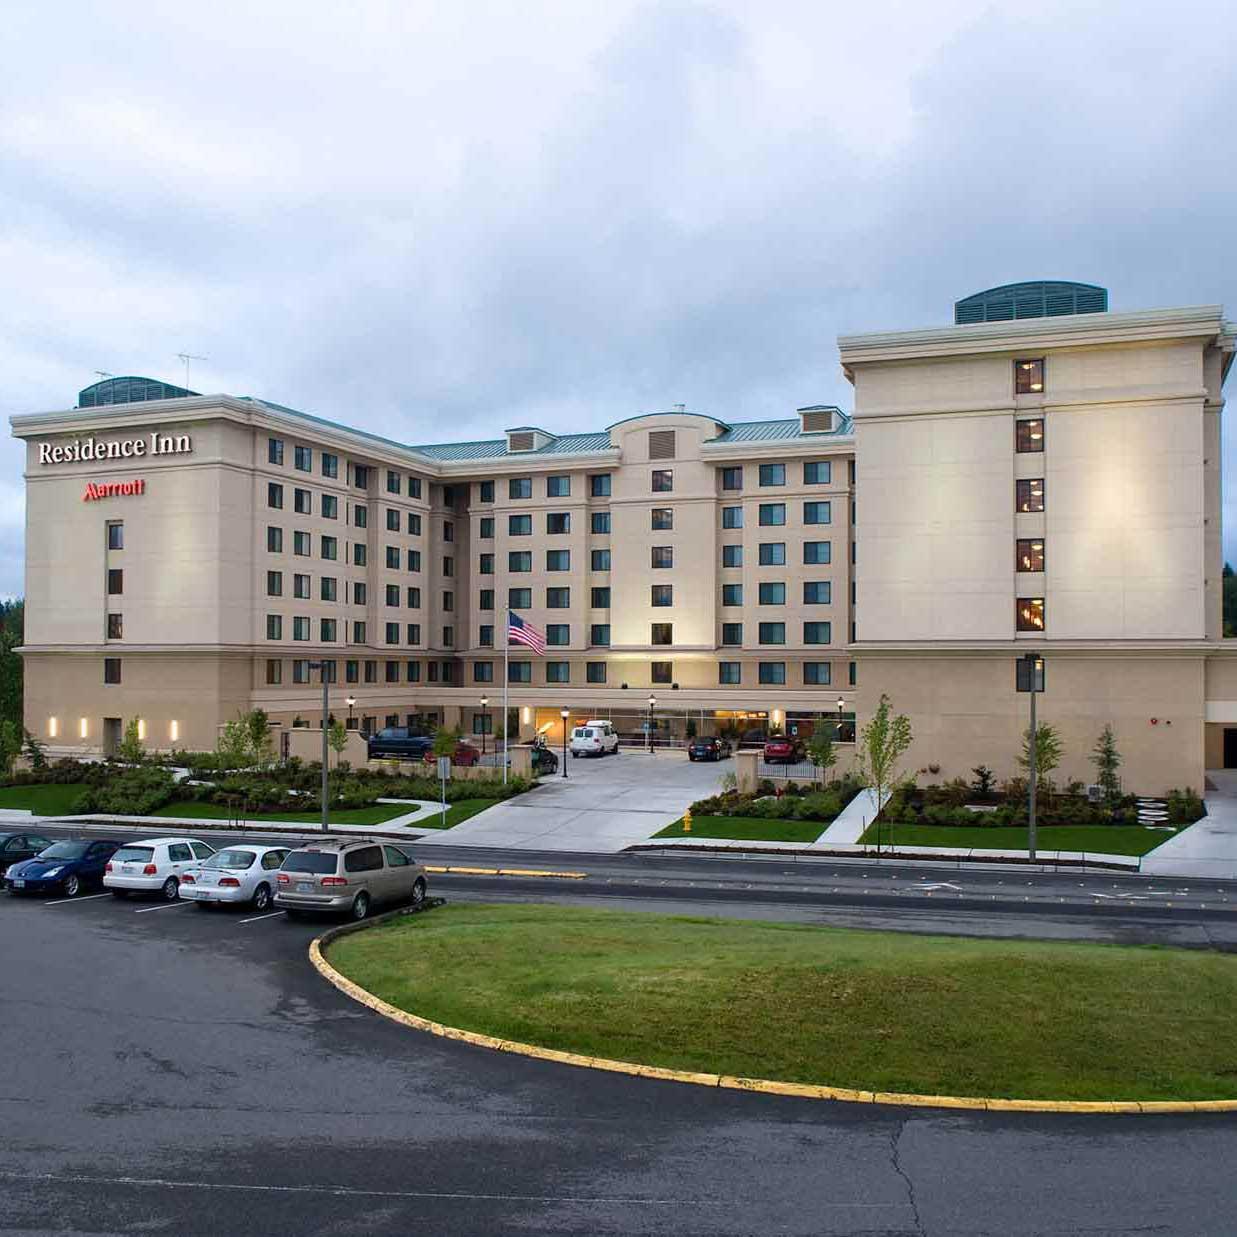 Bellevue Residence Inn By Marriott Global Holdings